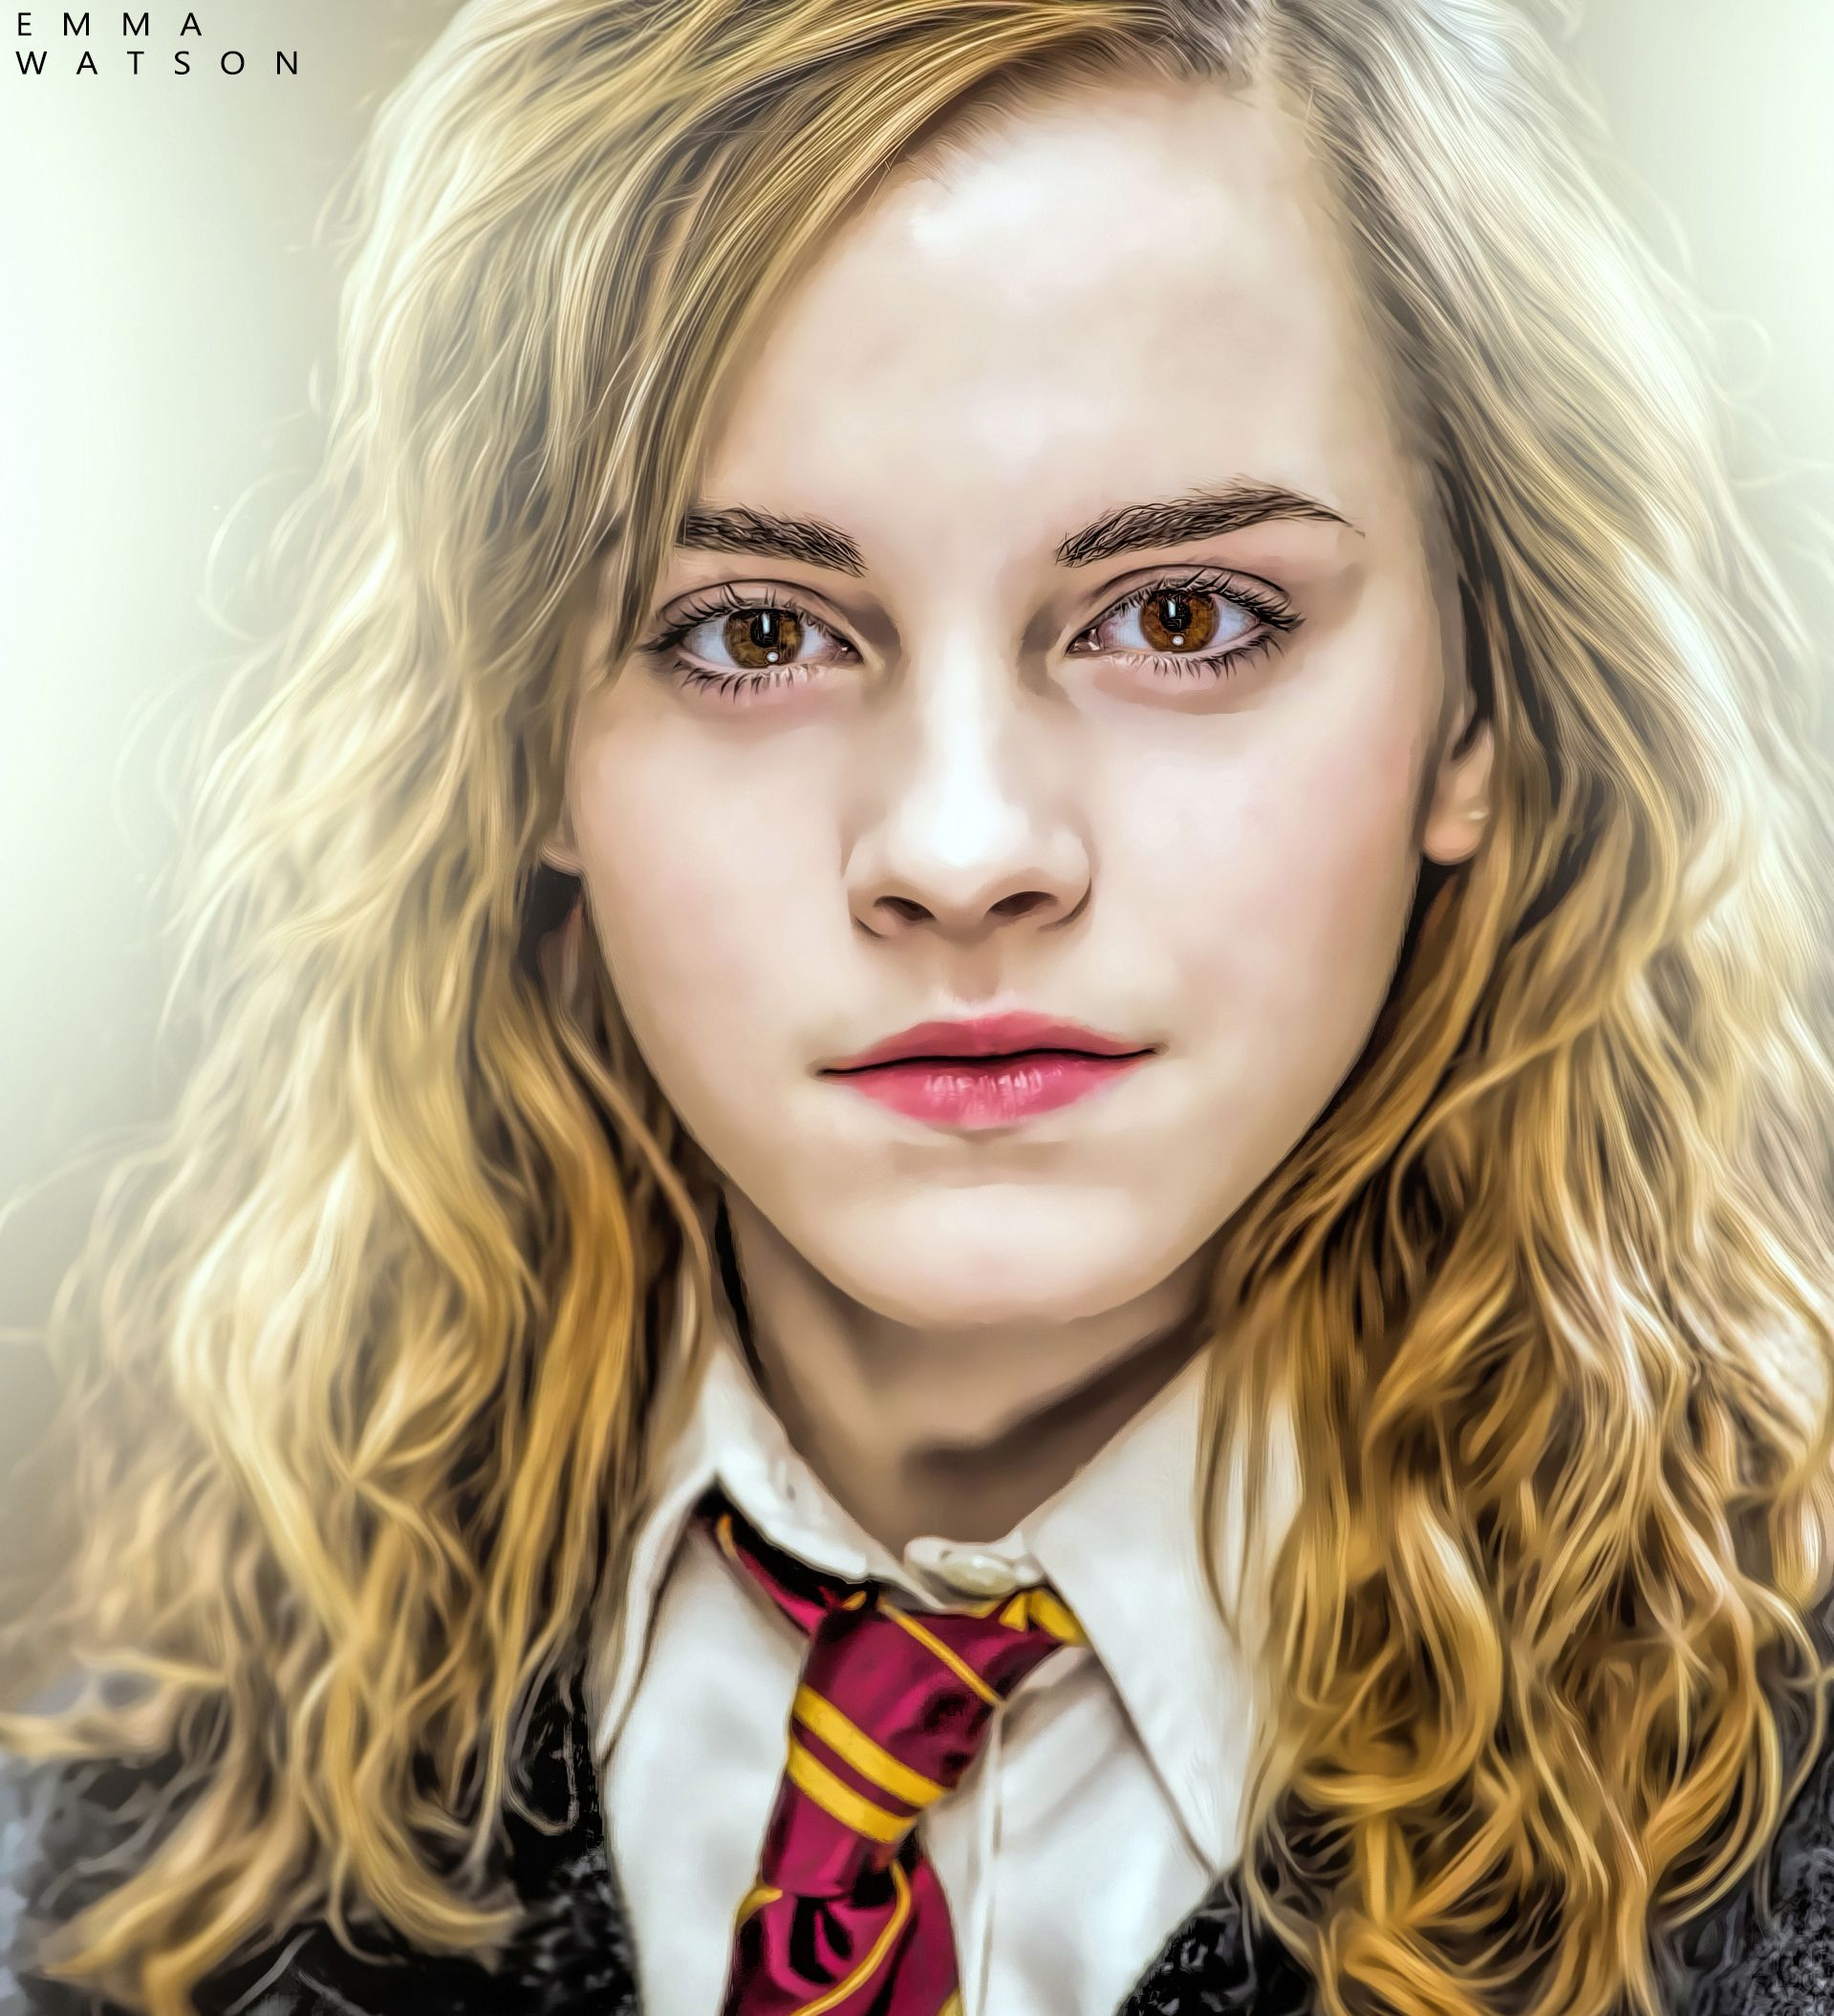 Emma Watson Hollywood, Emma watson, Celebrities